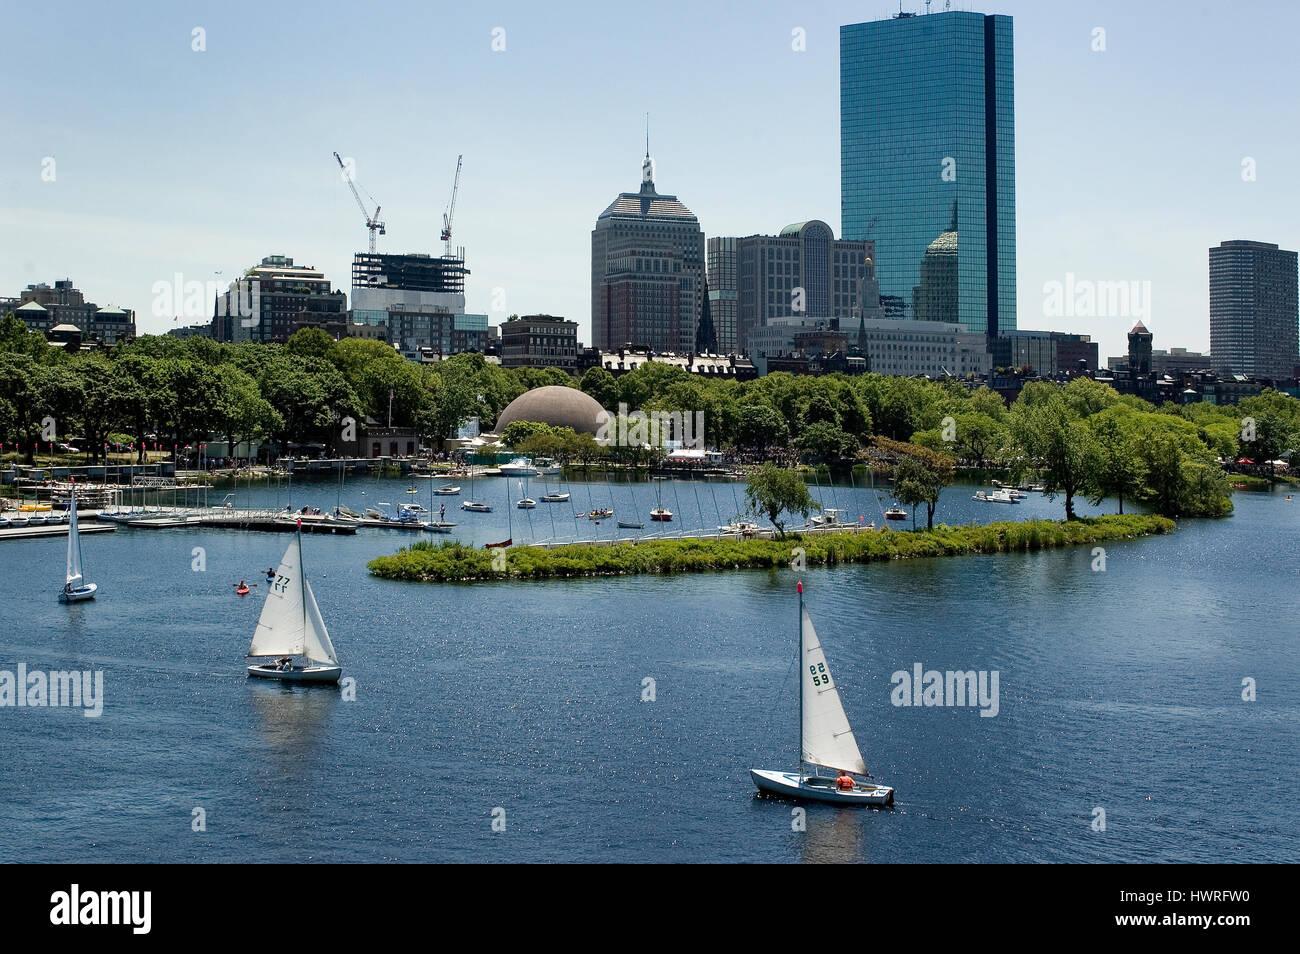 Boston's Back Bay buildings and the Esplanade Lagoon from the Longfellow Bridge, Boston, Massachusetts Stock Photo